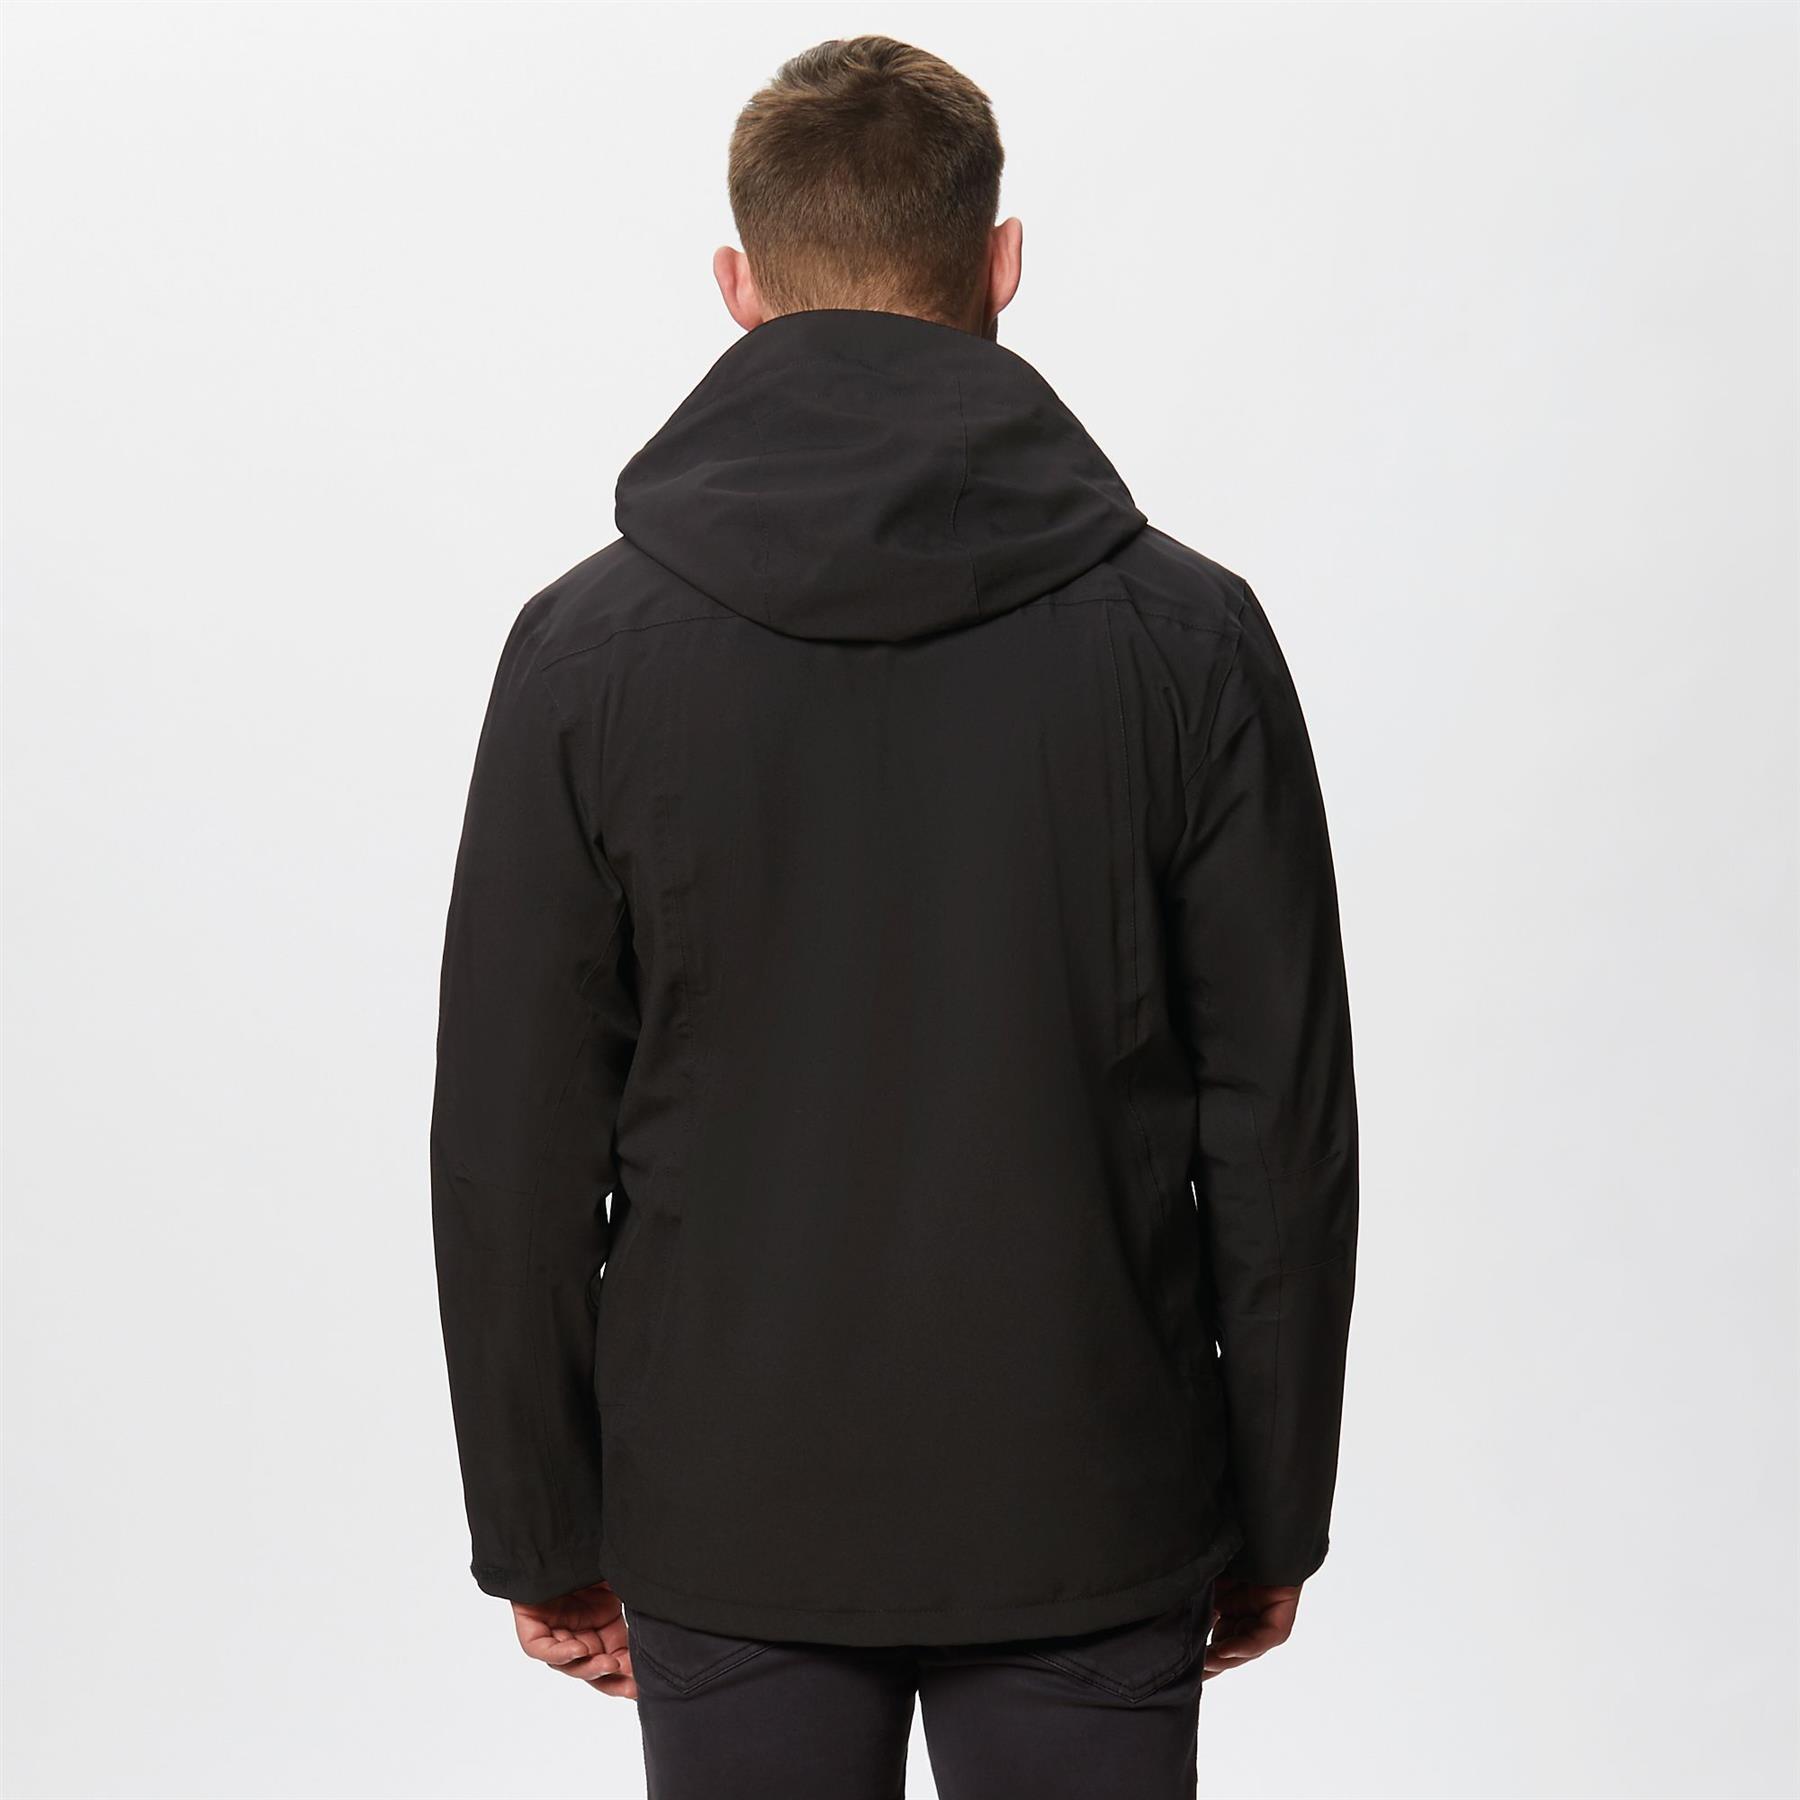 miniatuur 4 - Regatta Mens X-Pro Exosphere Stretch Waterproof Hooded Jacket